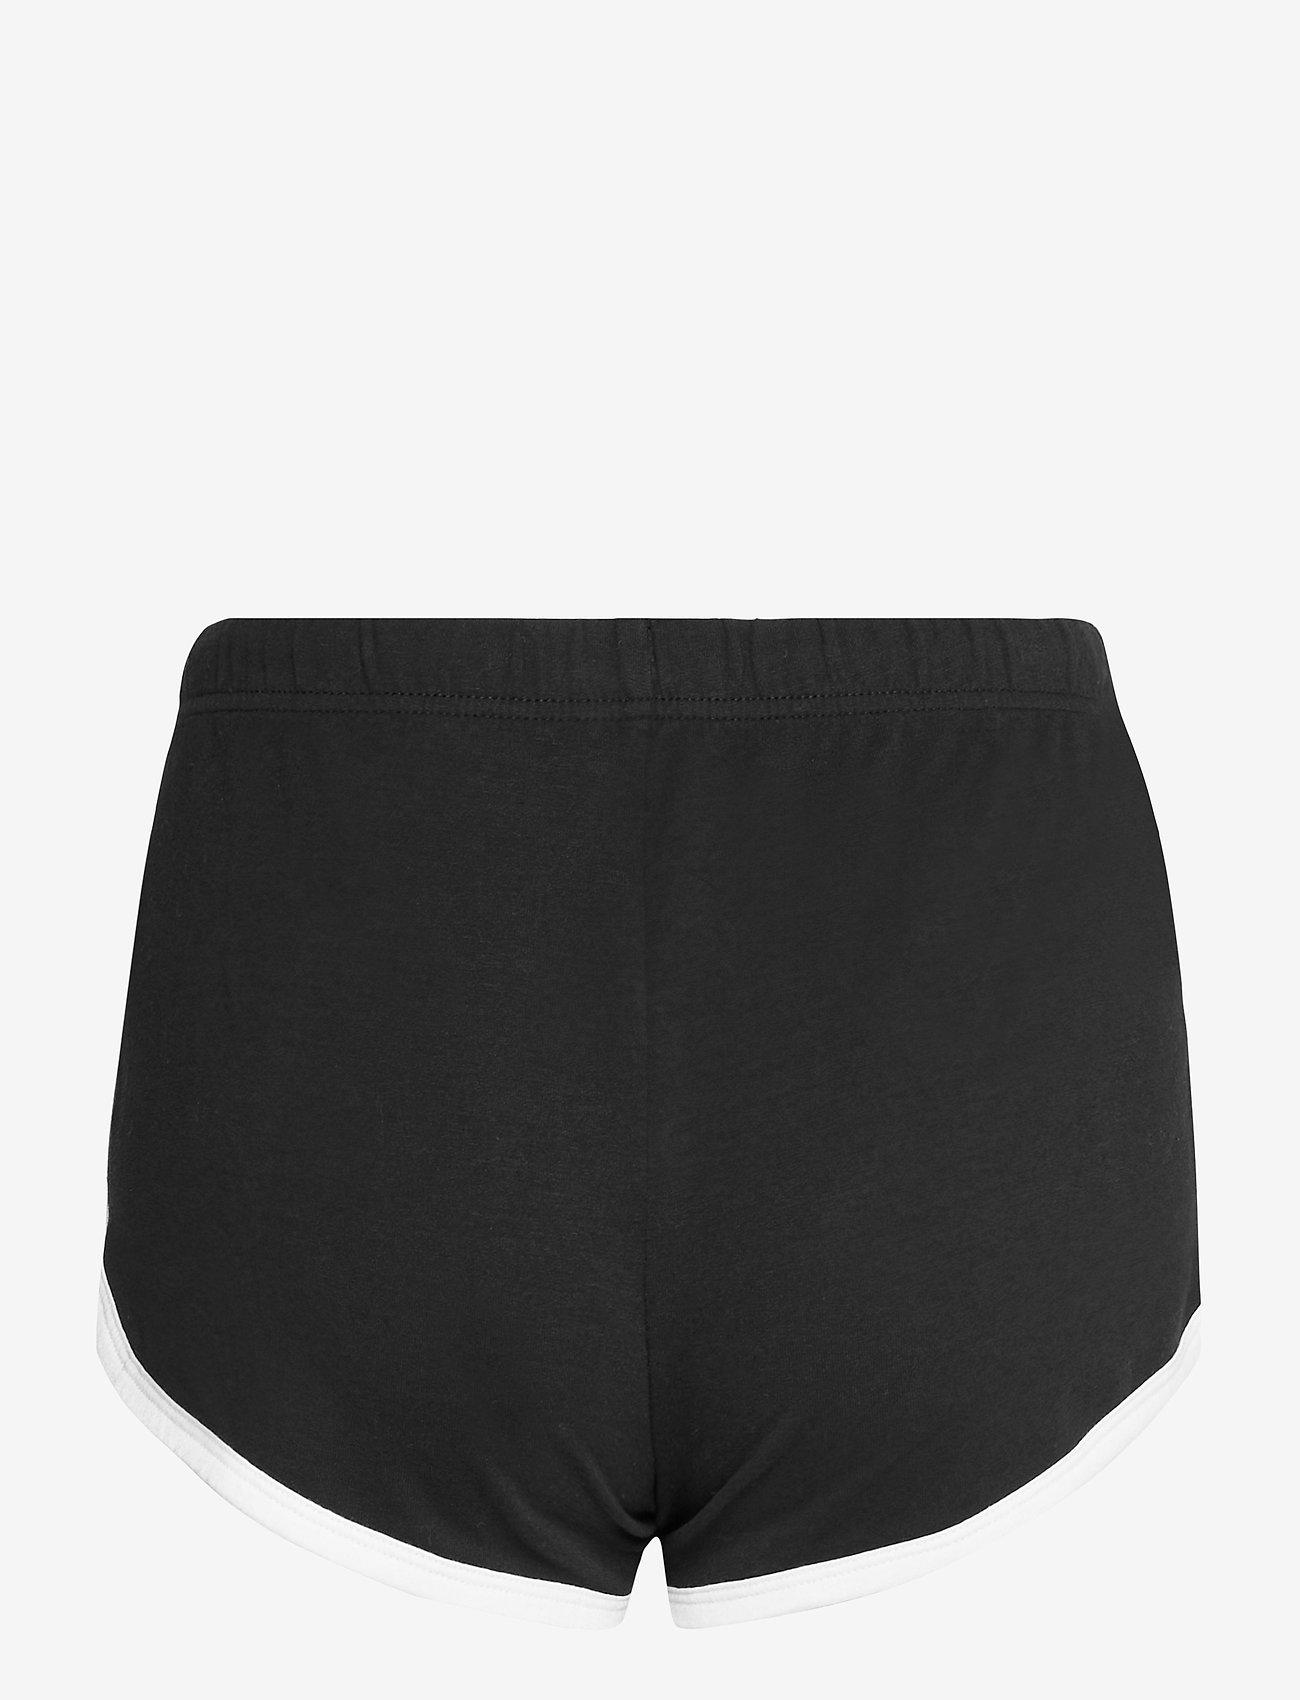 Hollister - HCo. GIRLS SHORTS - shorts casual - black - 1